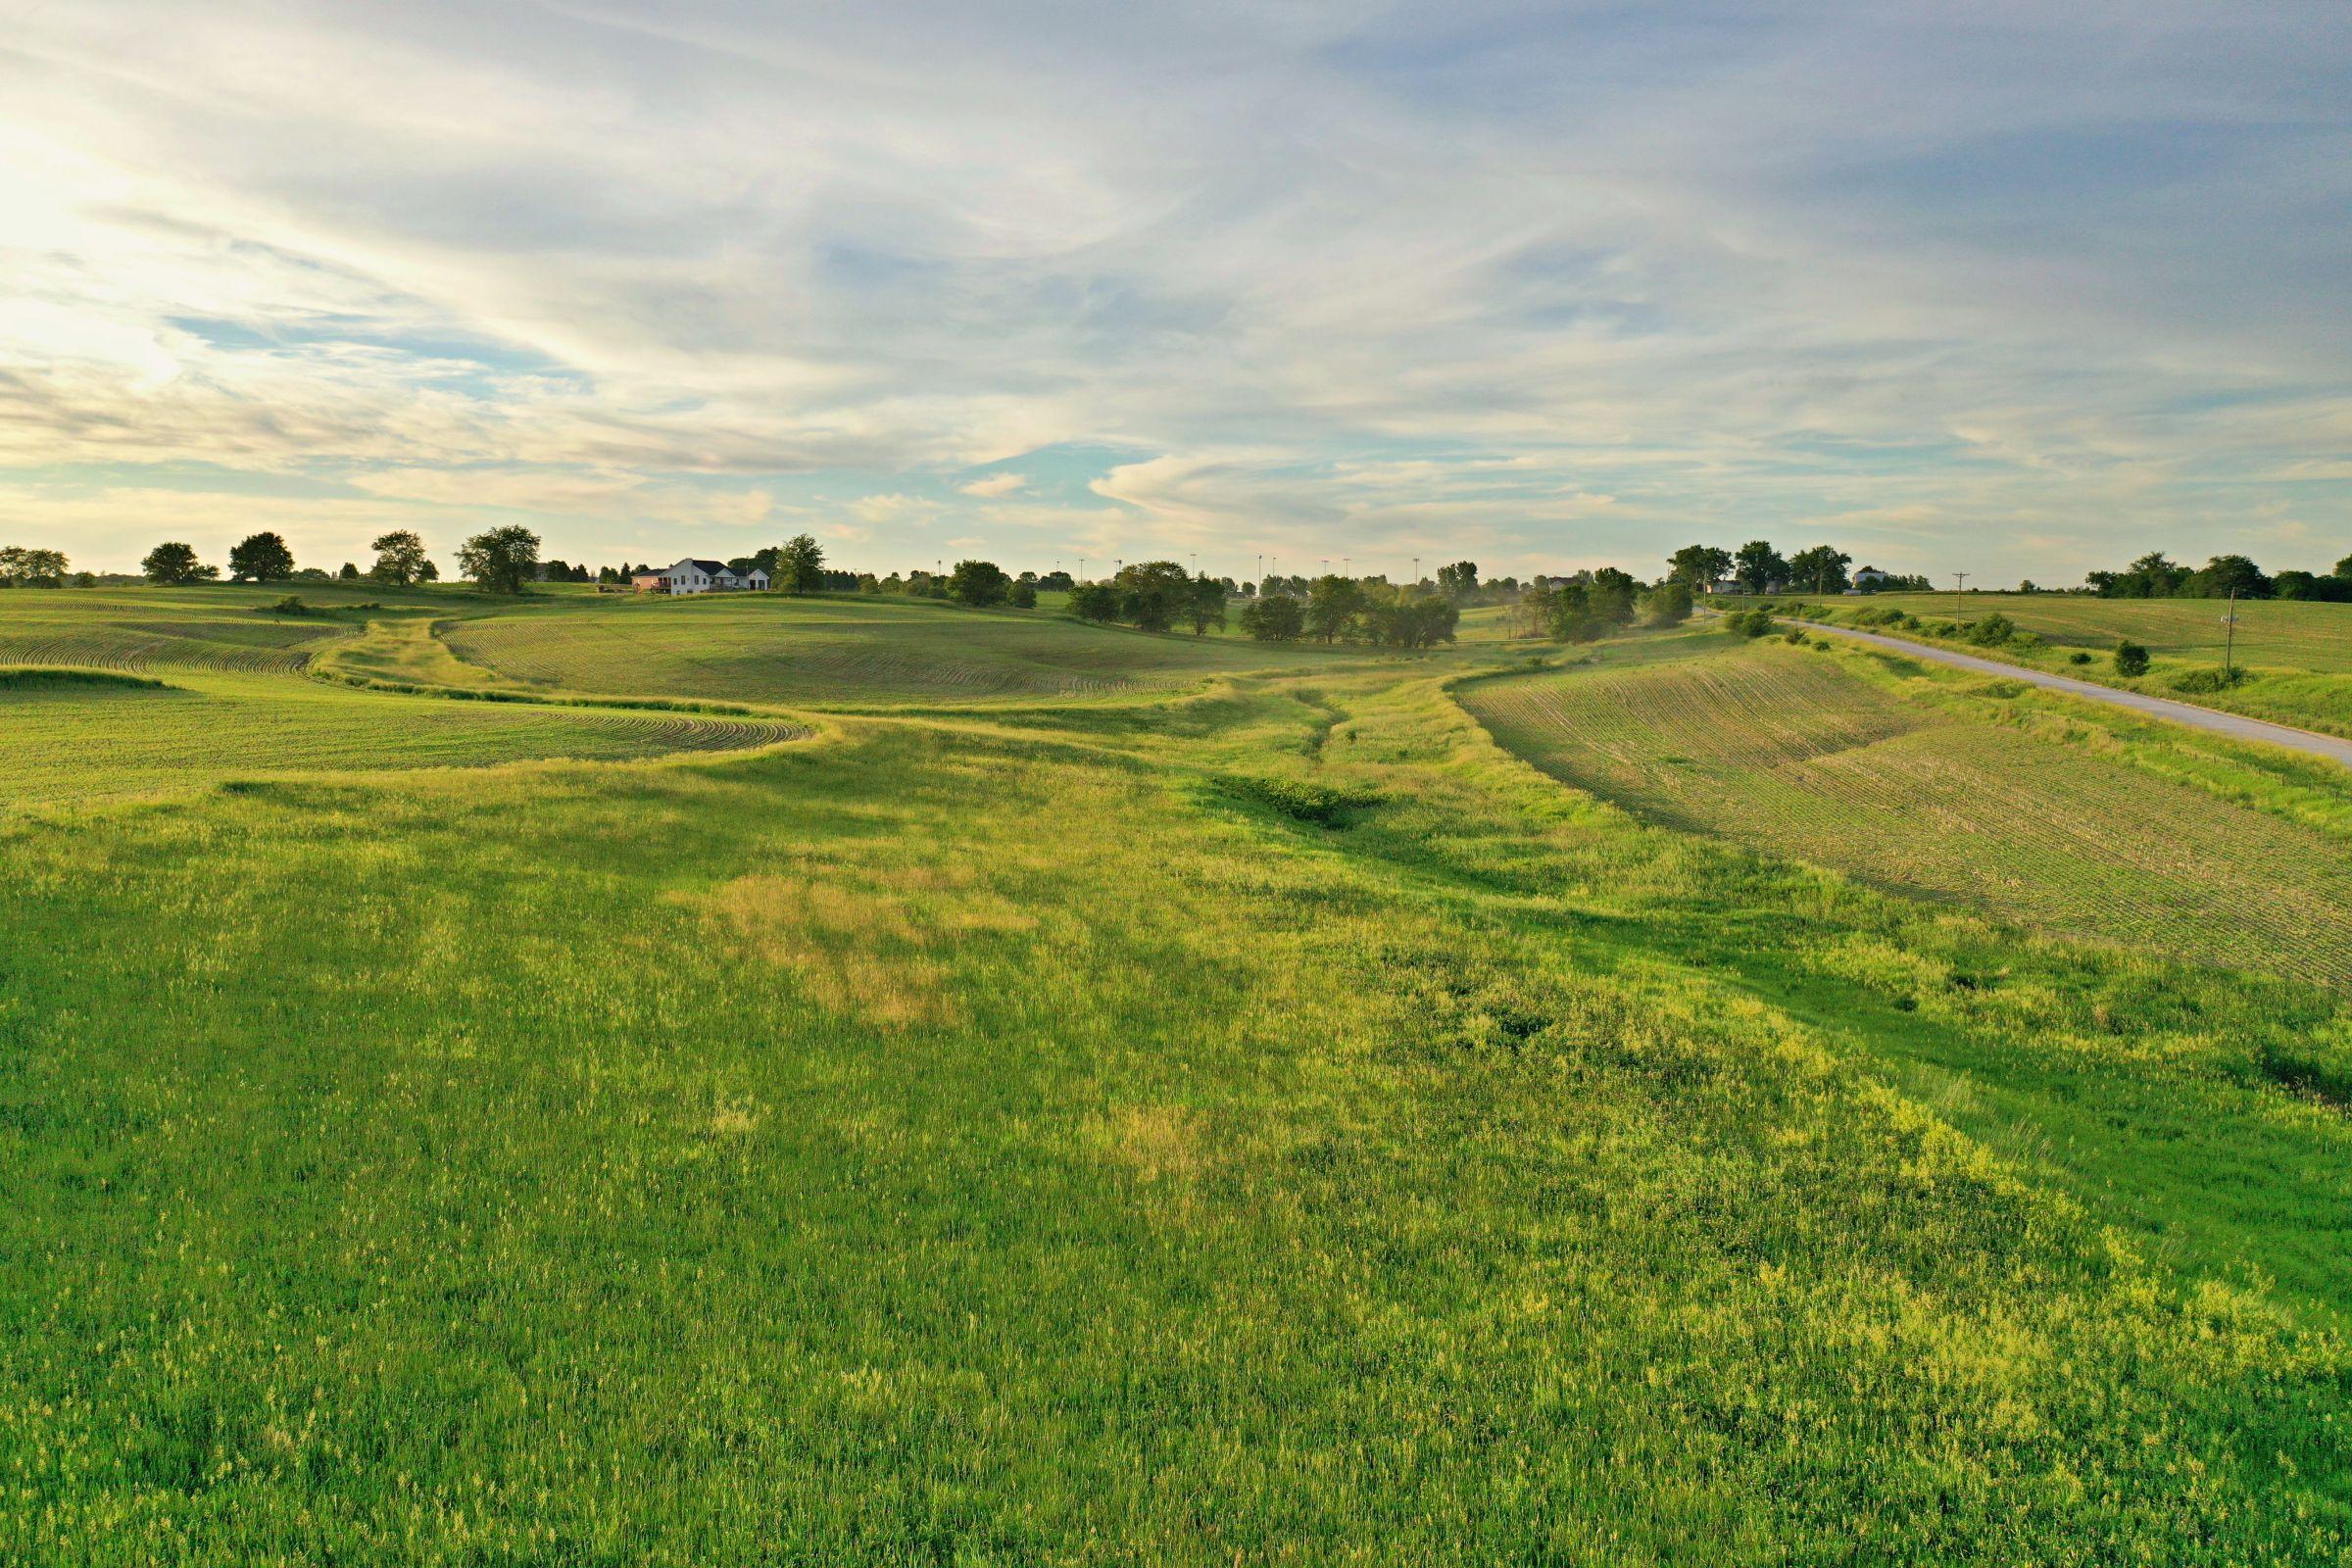 land-warren-county-iowa-80-acres-listing-number-15328-3-2021-01-25-192210.JPG